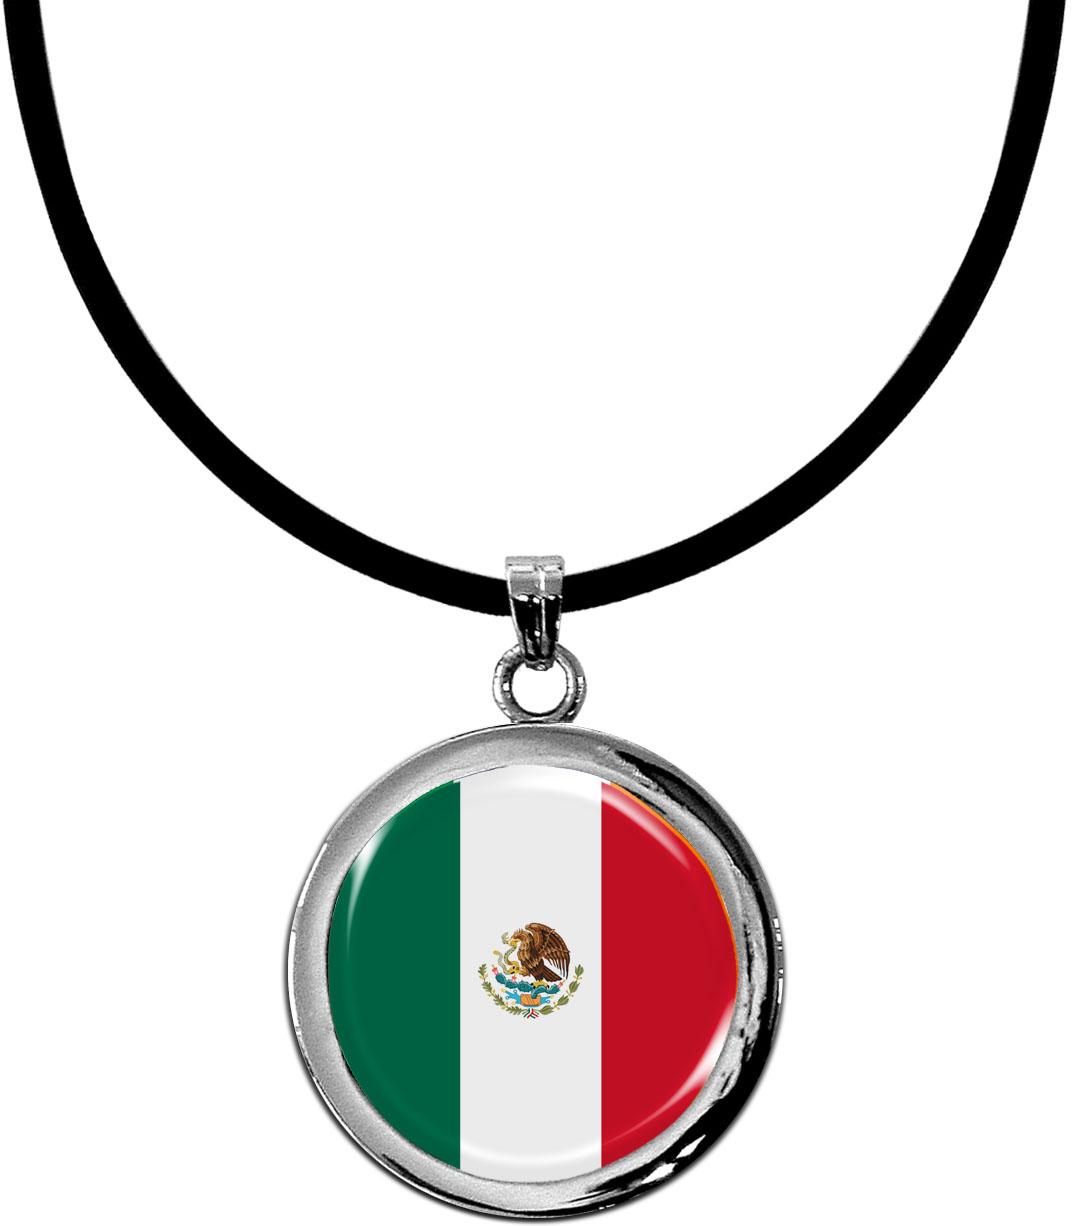 Kettenanhänger / Mexiko / Silikonband mit Silberverschluss